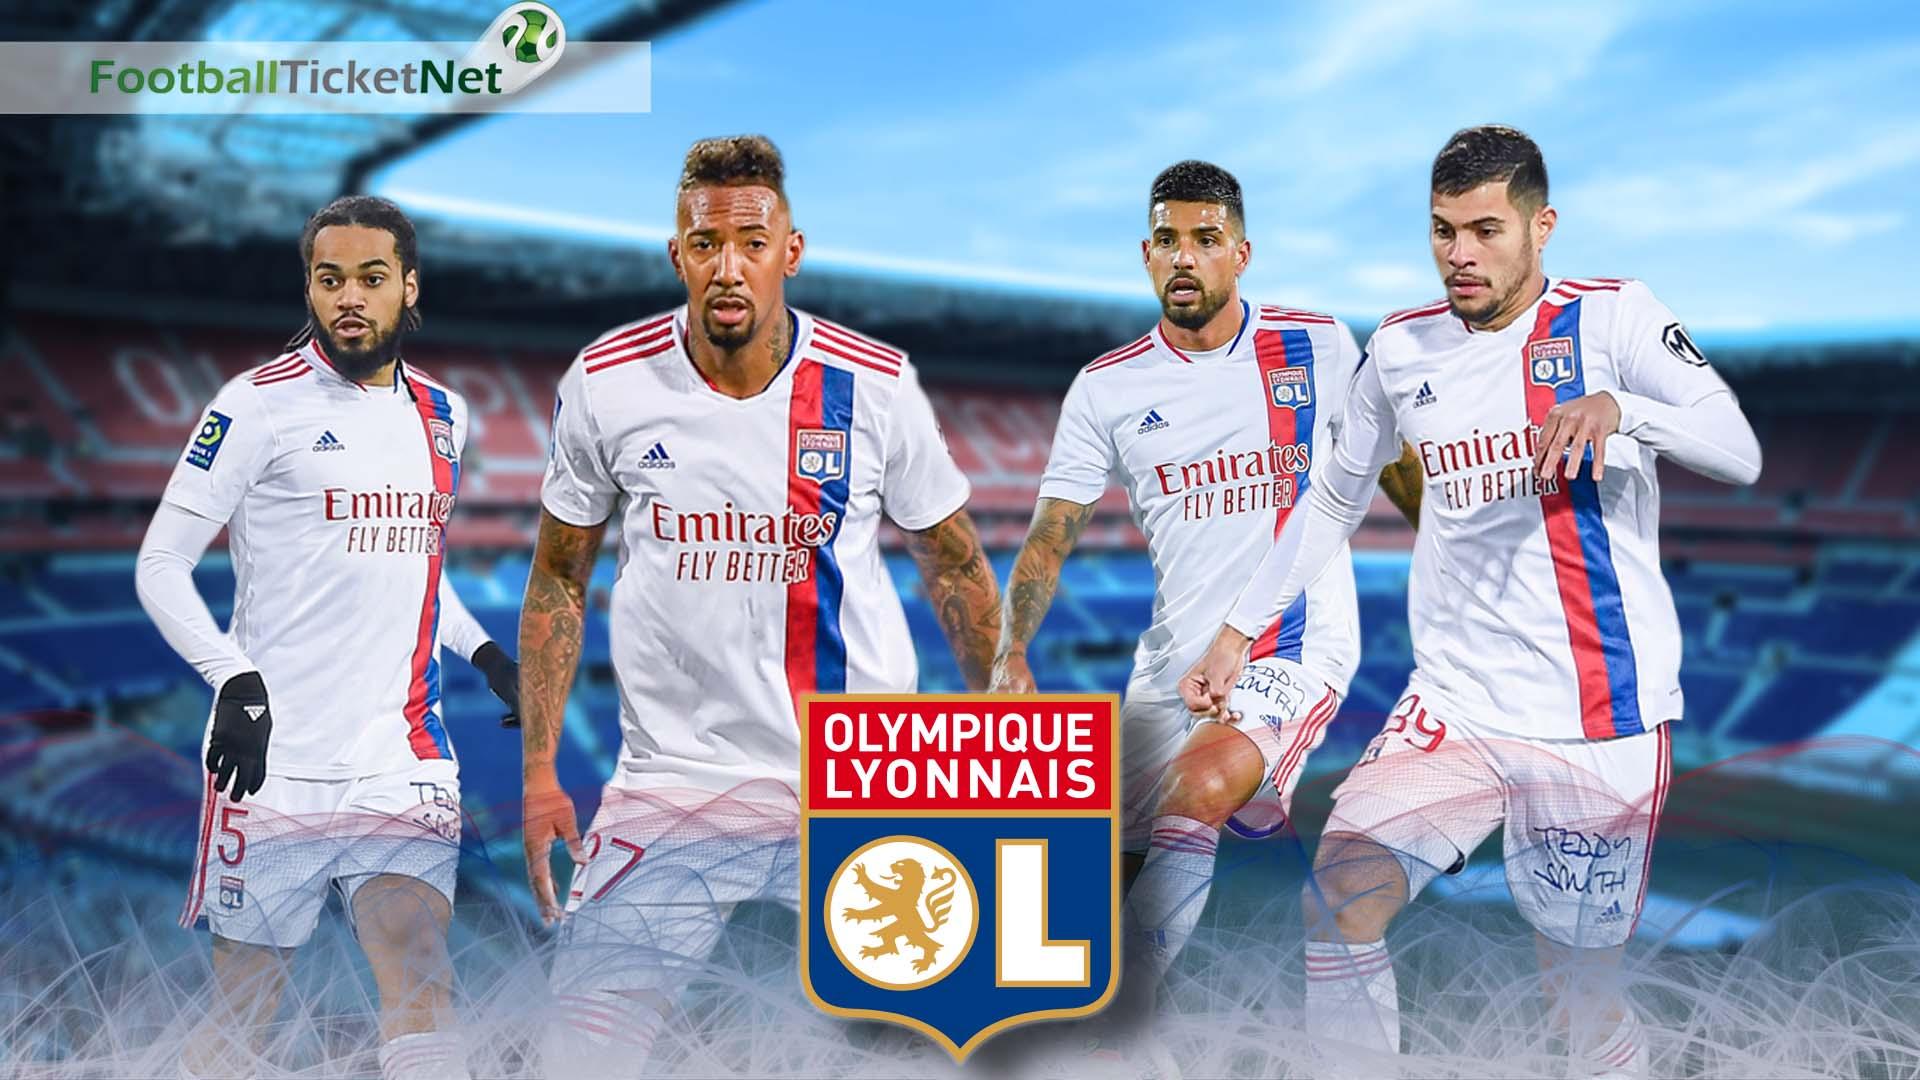 Olympique Lyonnais Tickets 2018/19 Season